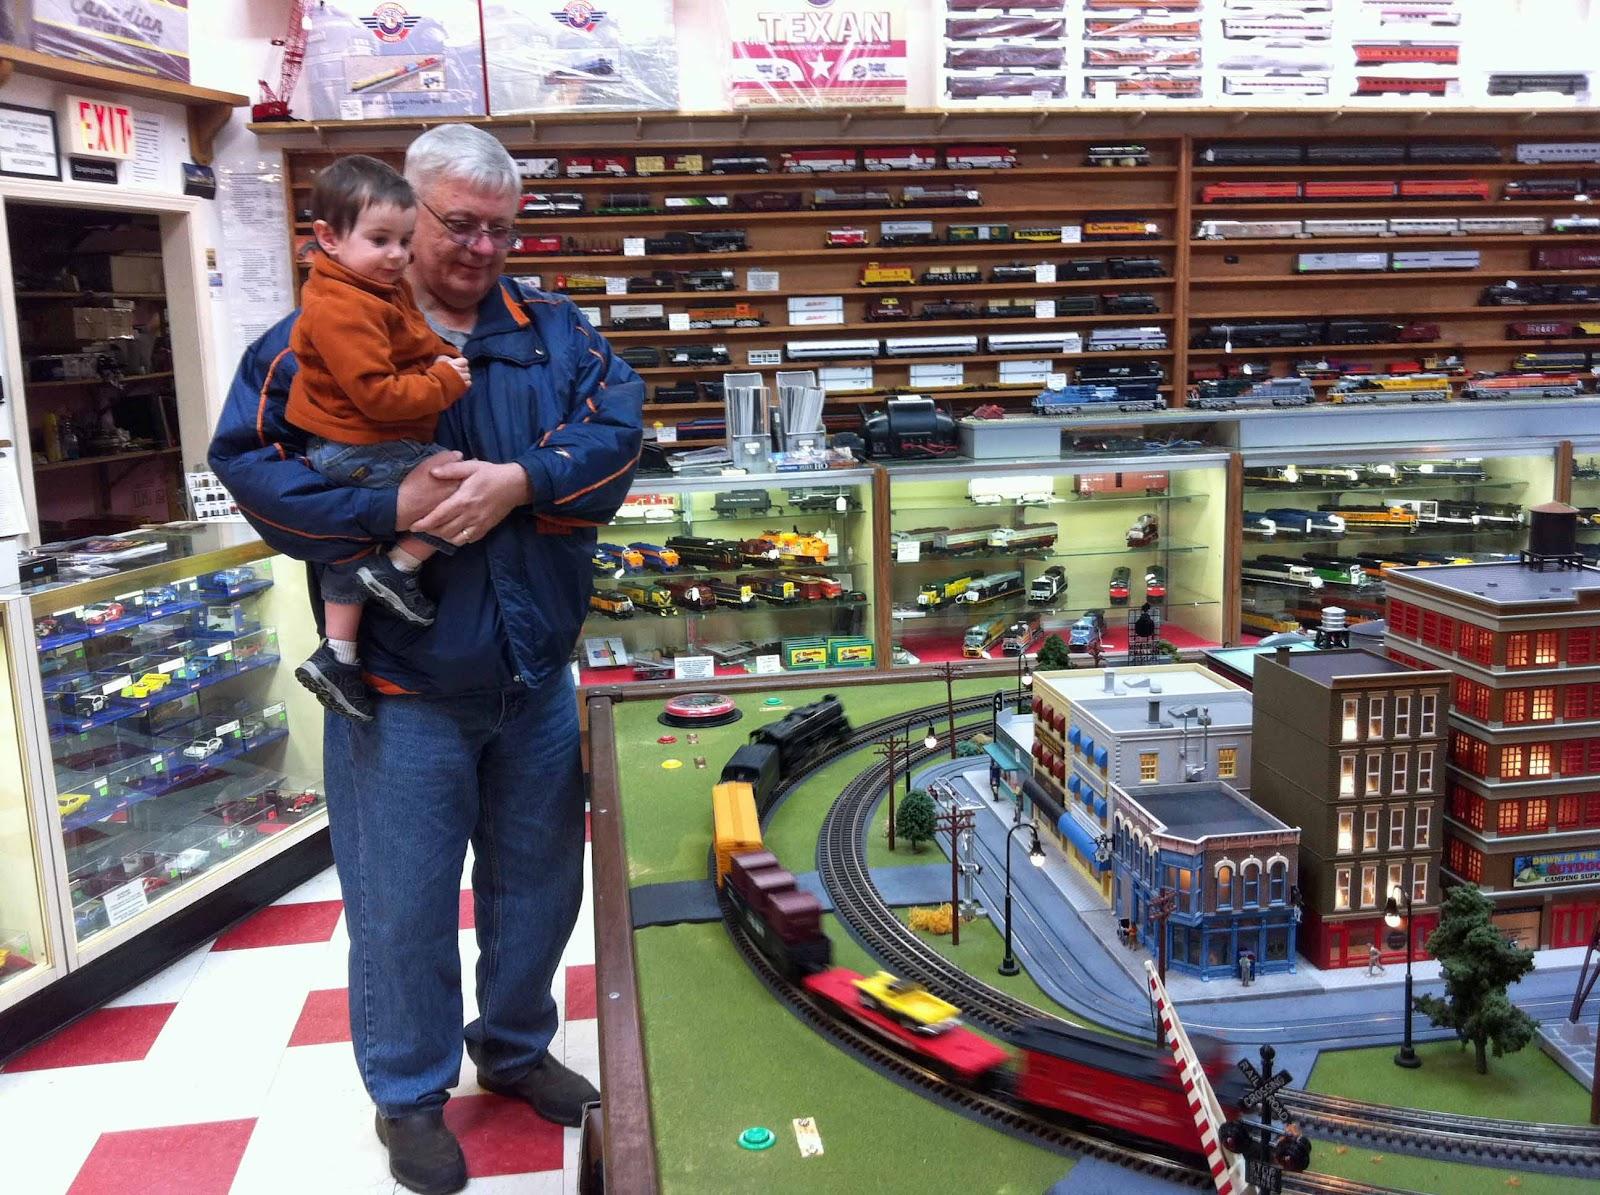 Toy train shop brighton